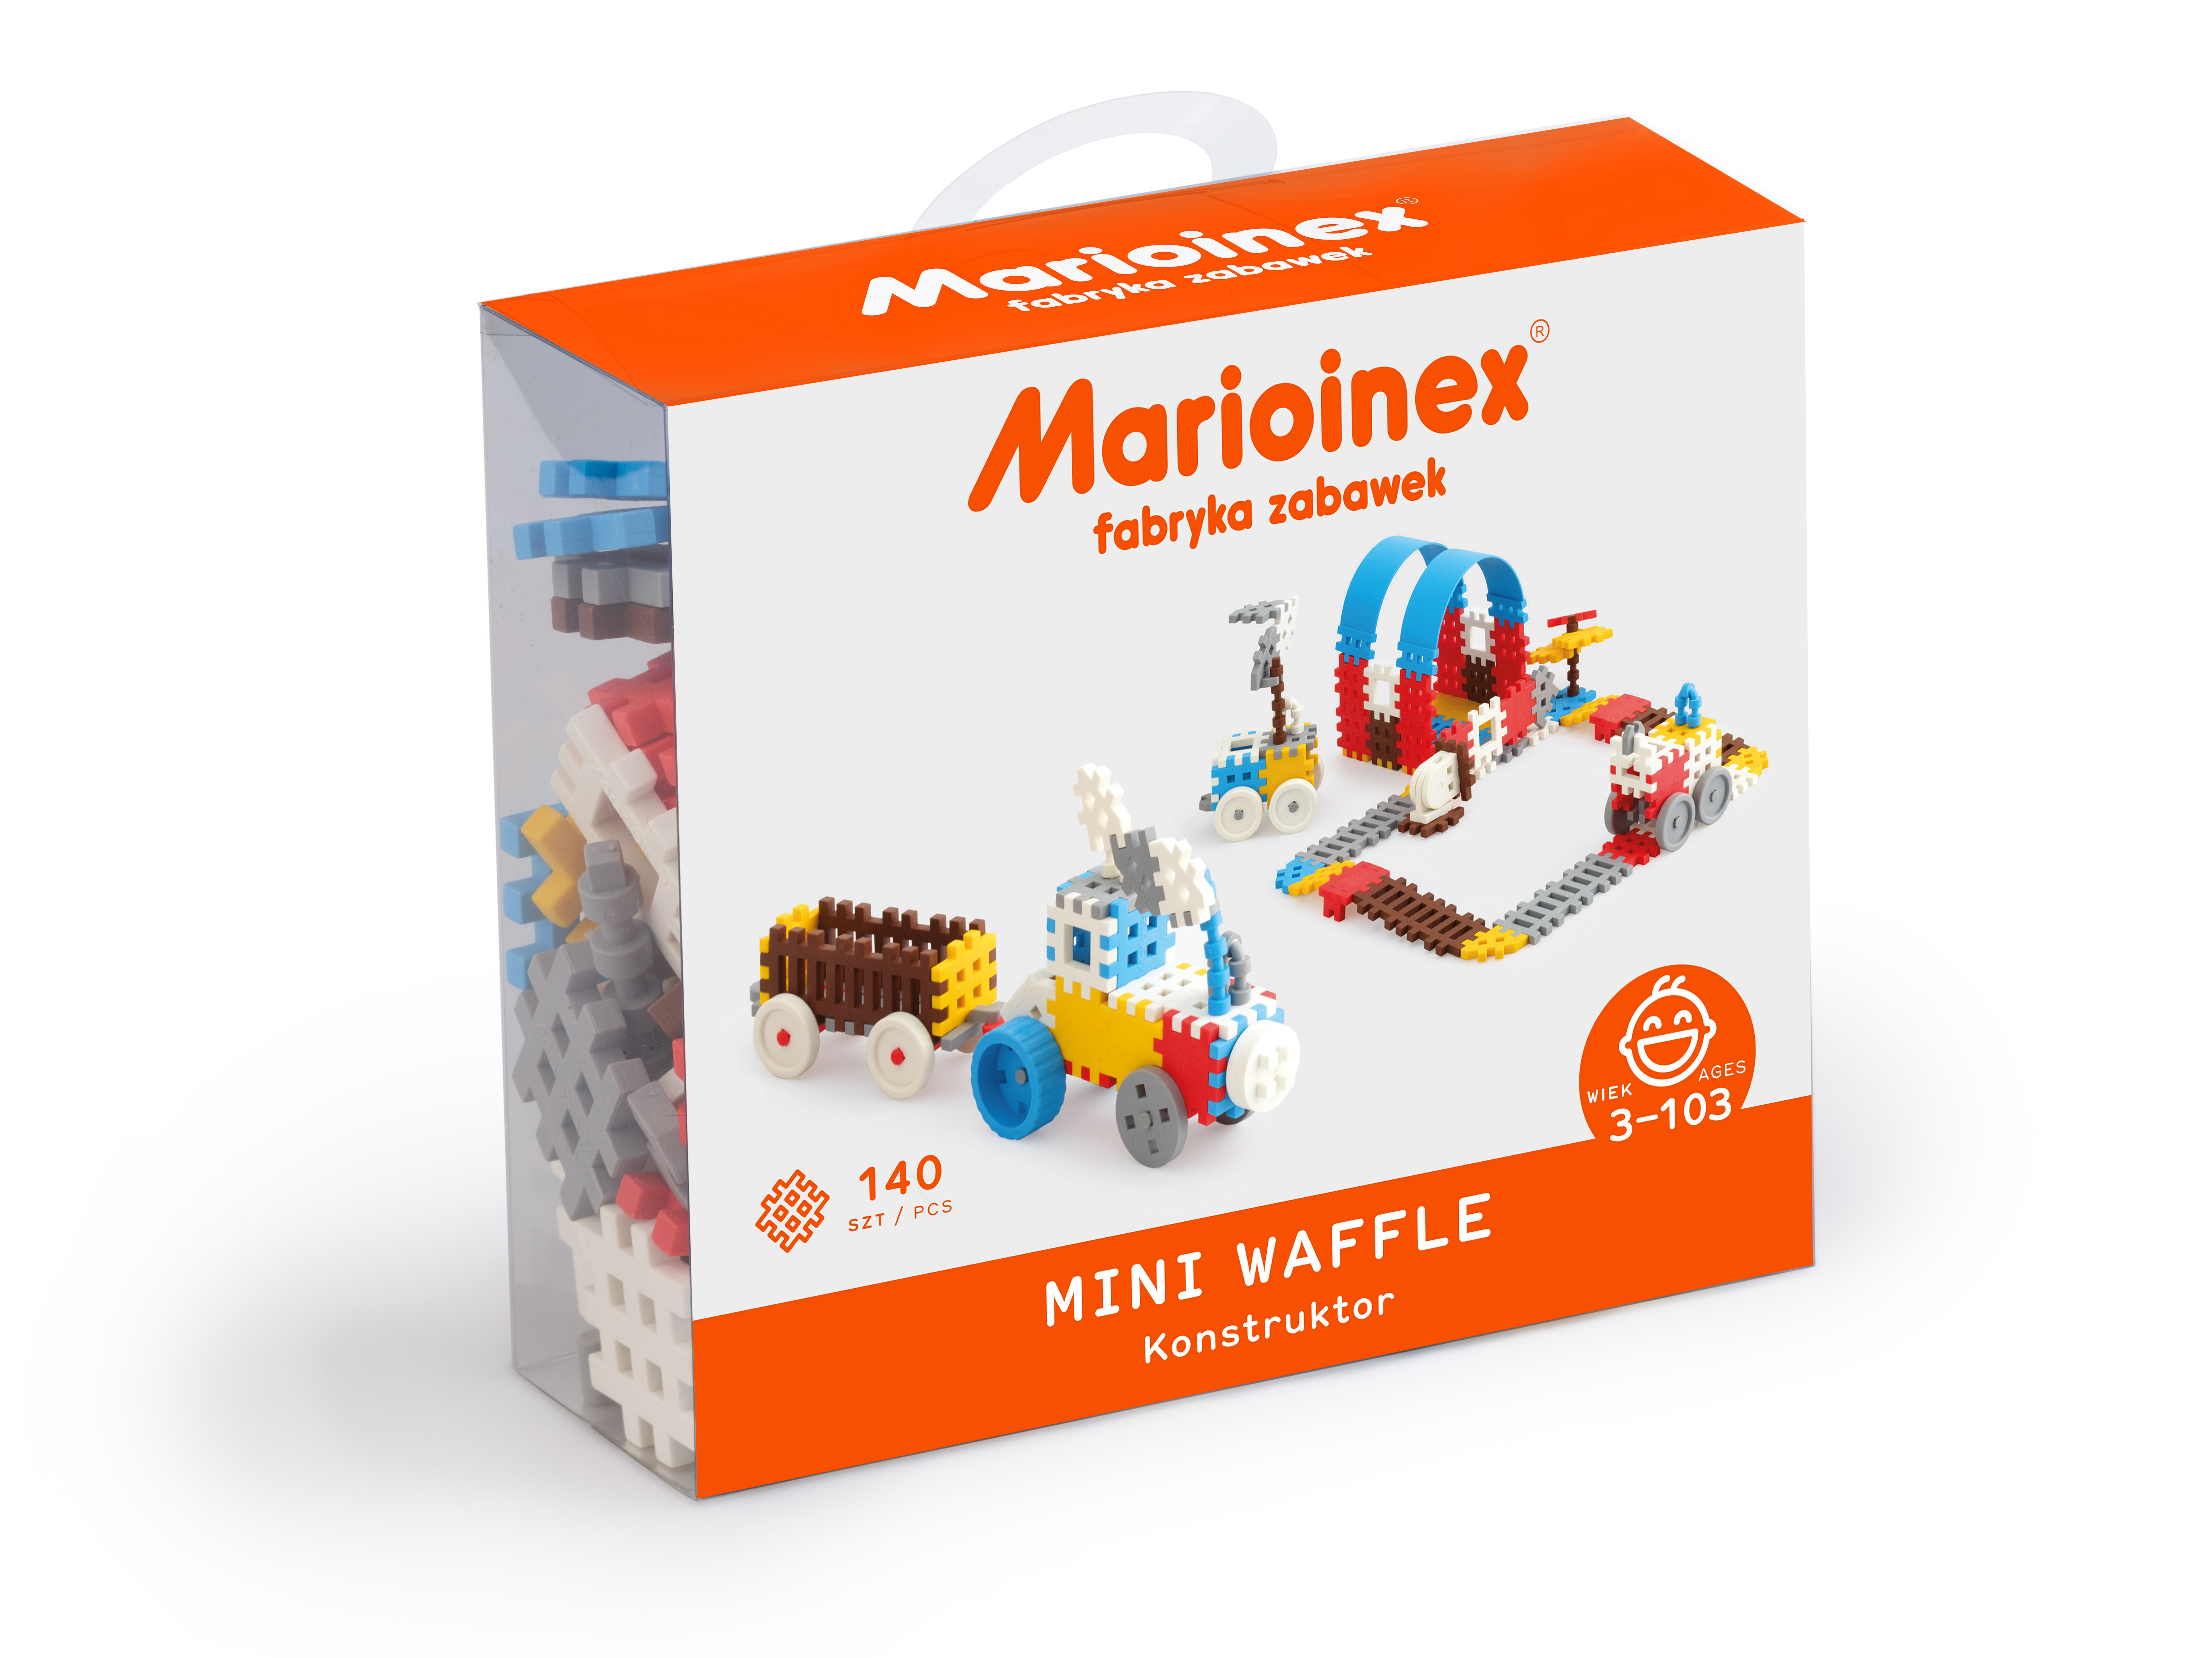 Marioinex MINI WAFLE – 140 ks Konstruktér (chlapci)